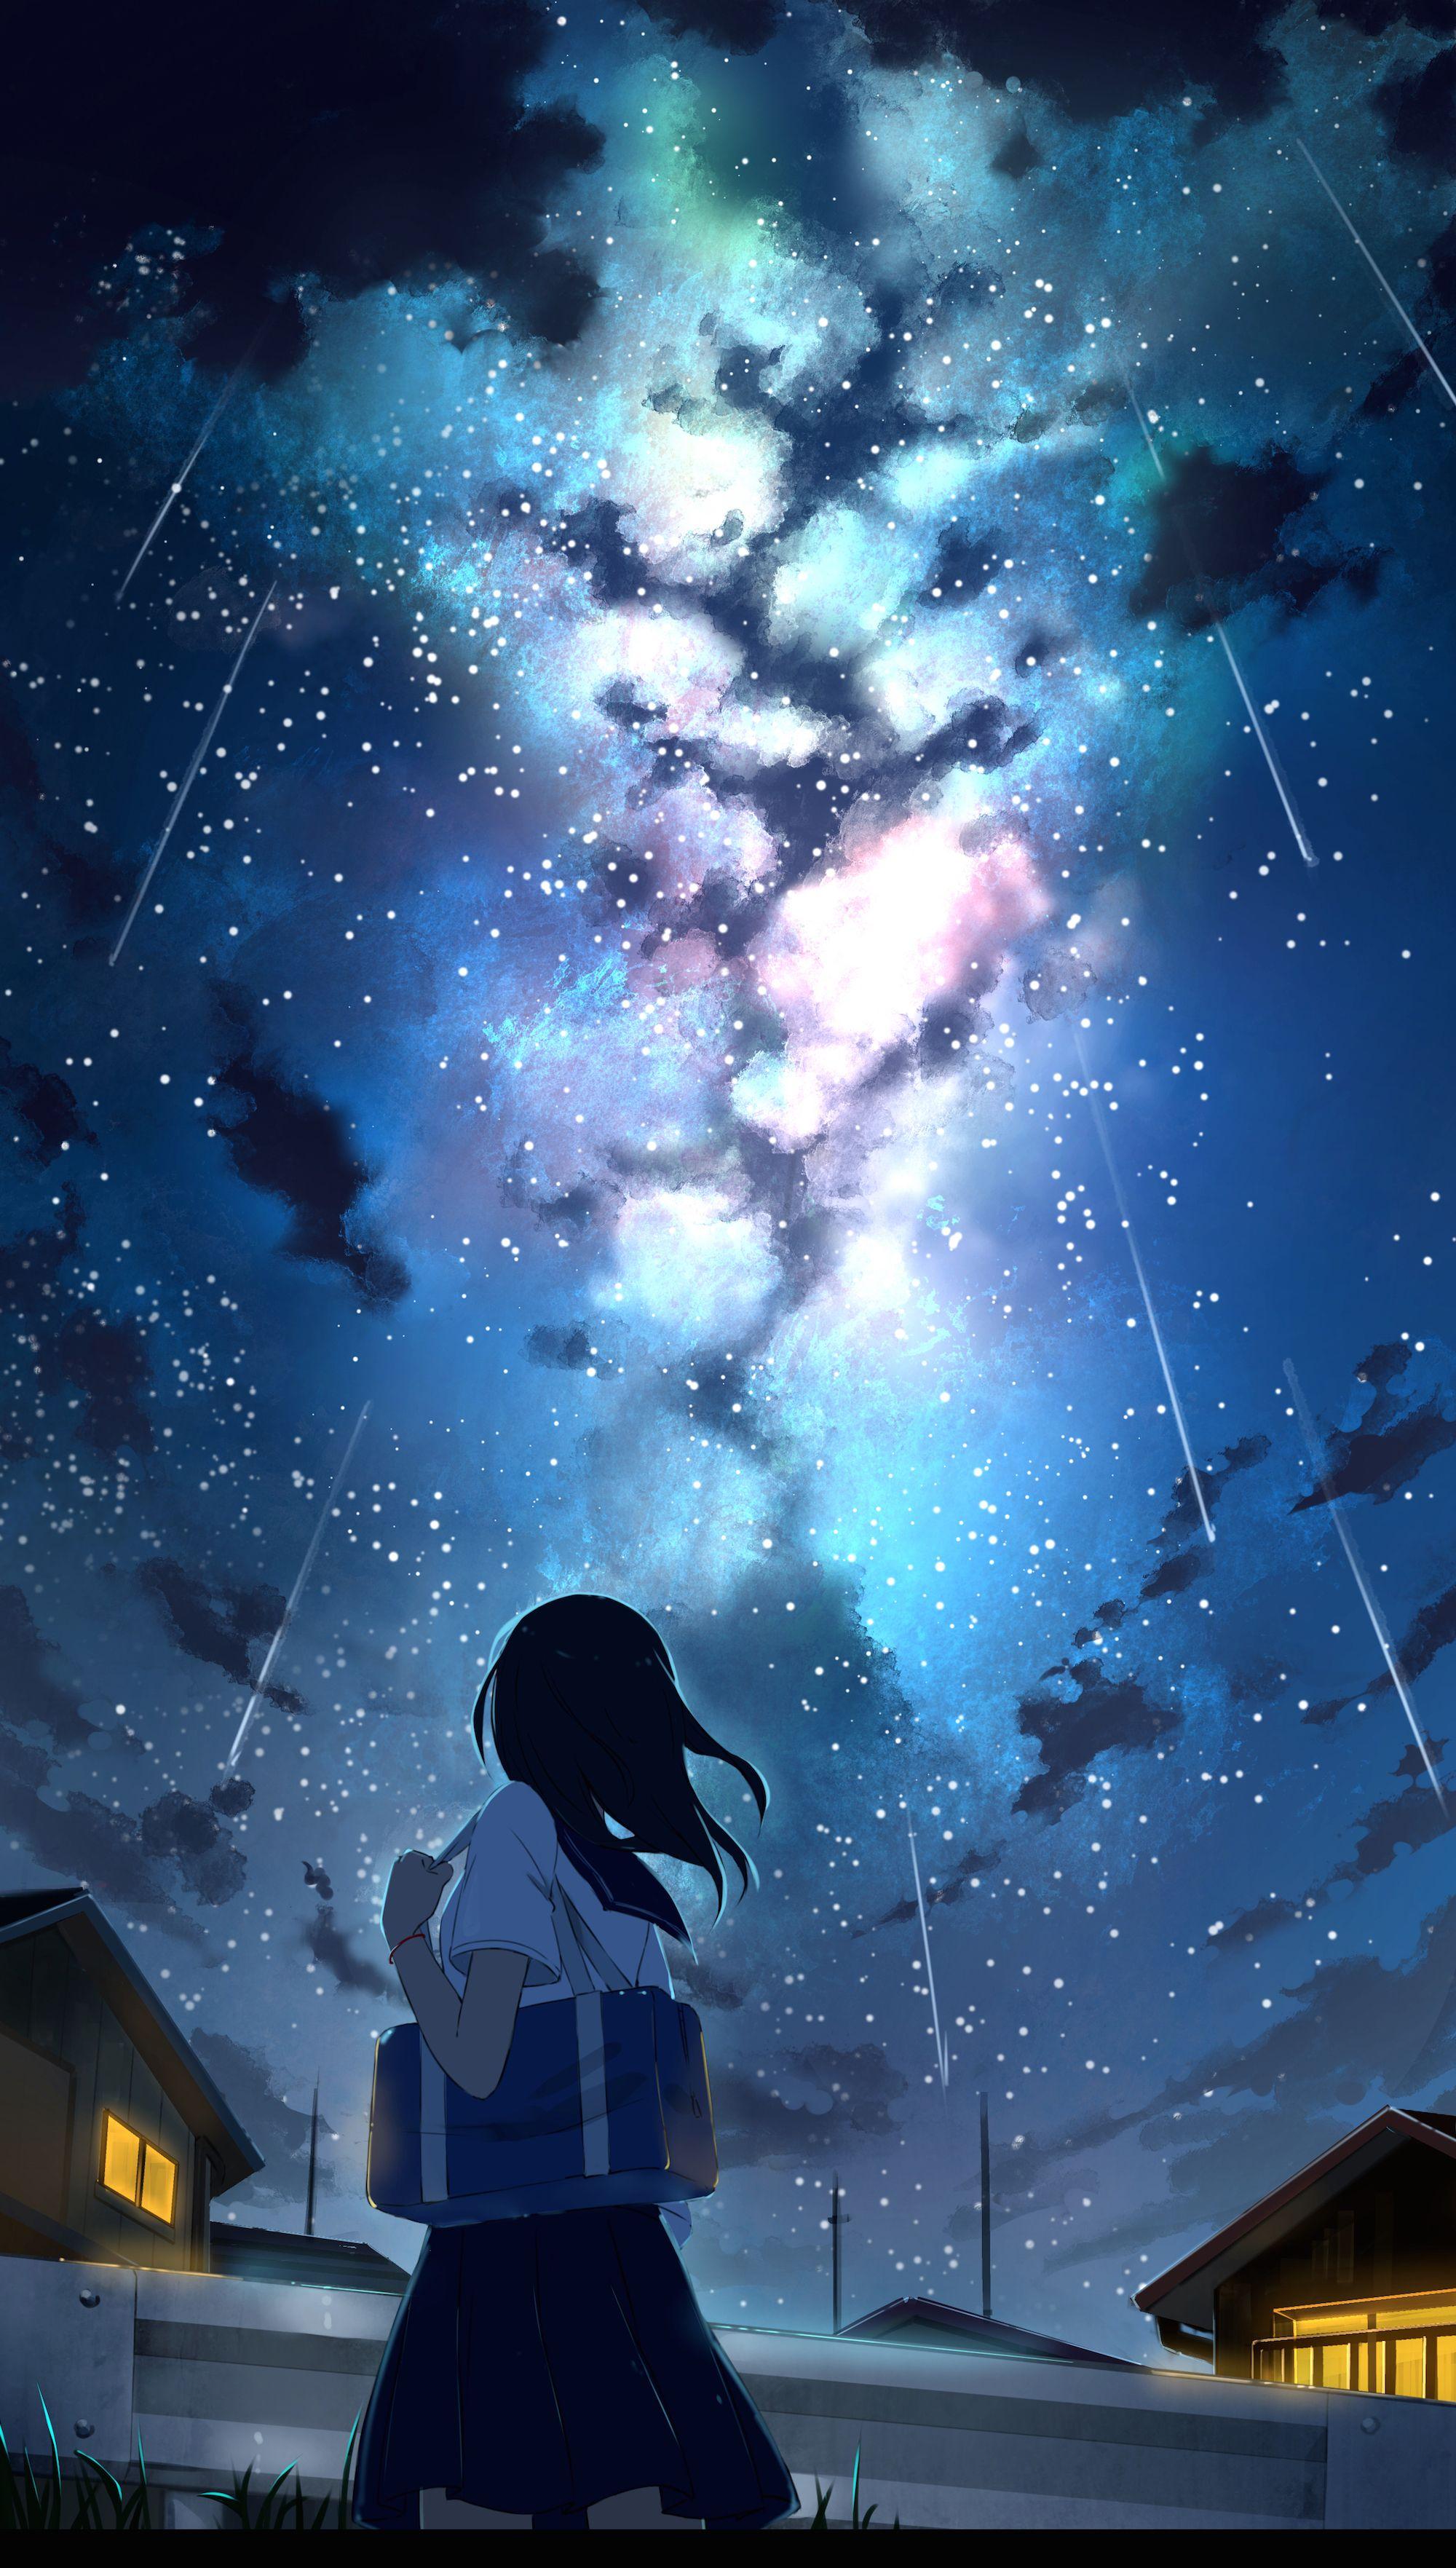 Artist: Mamigo | Anime scenery, Anime galaxy, Anime background